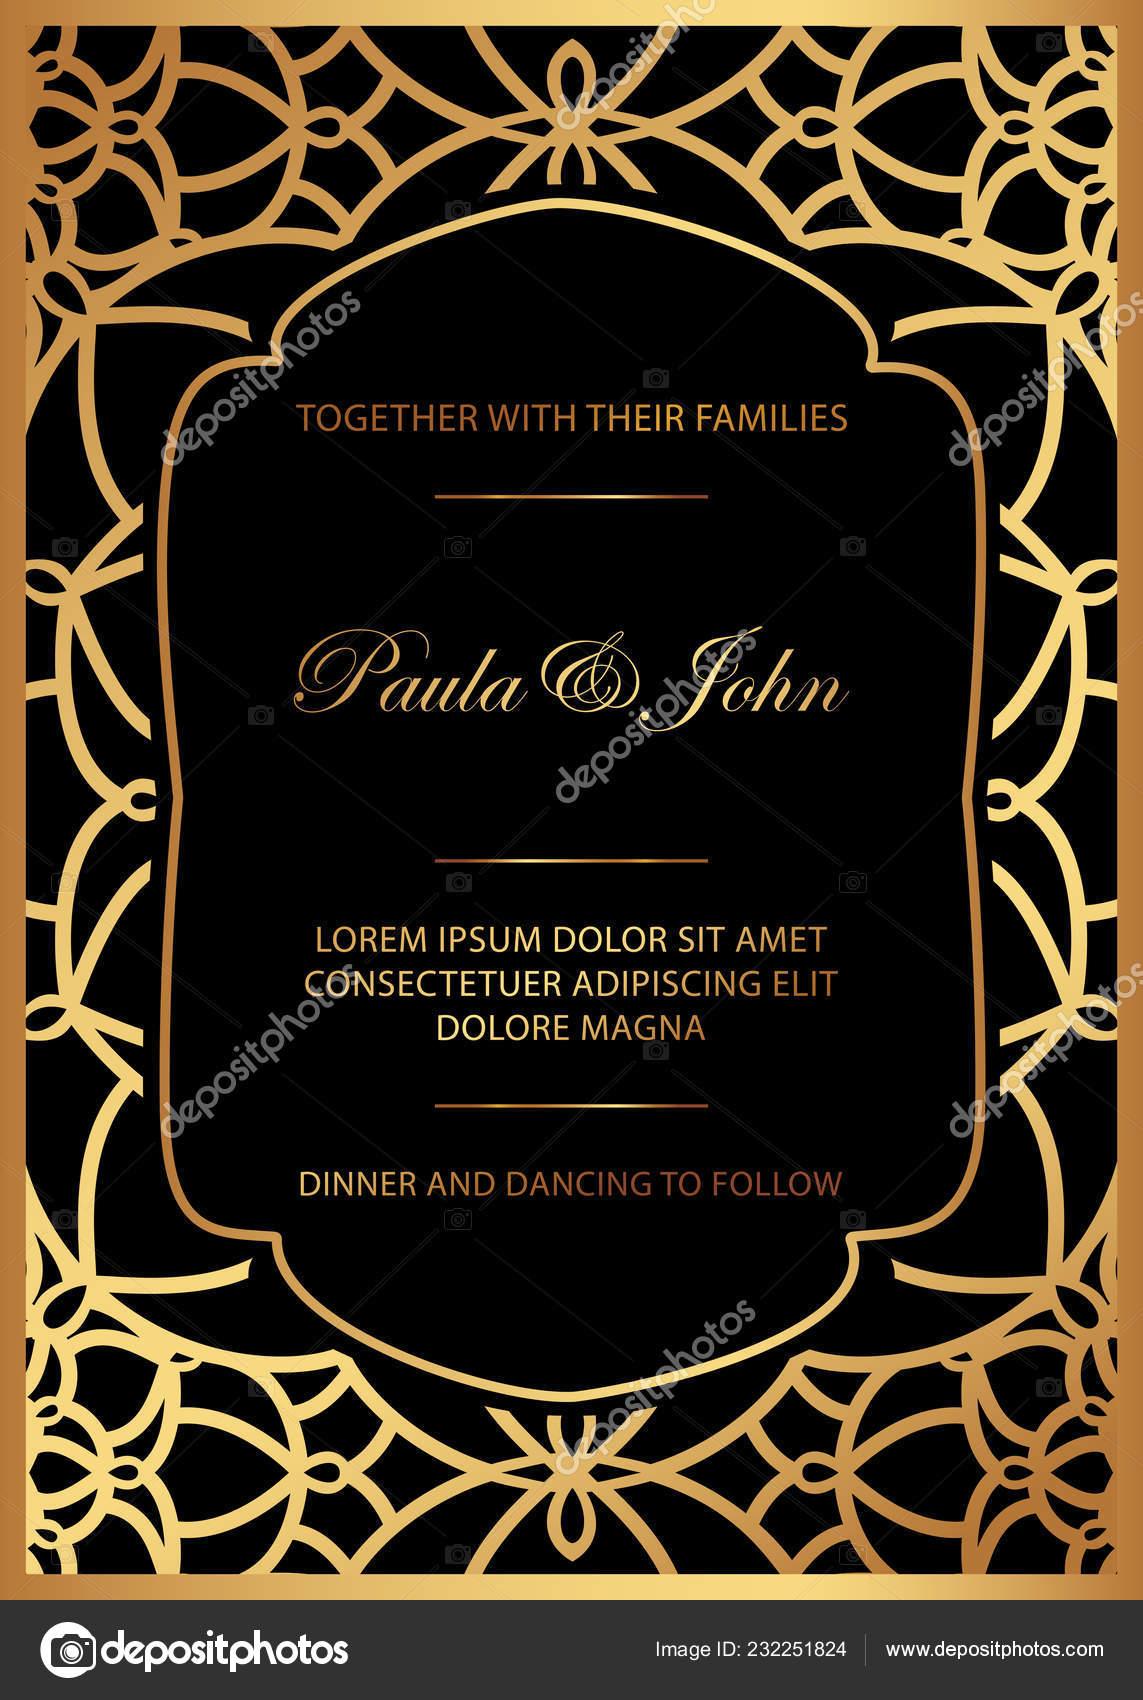 Black wedding invitation templates | Stylish Gold Black Wedding Card Royal  Vintage Wedding Invitation Template — Stock Vector © nicemosaic #232251824